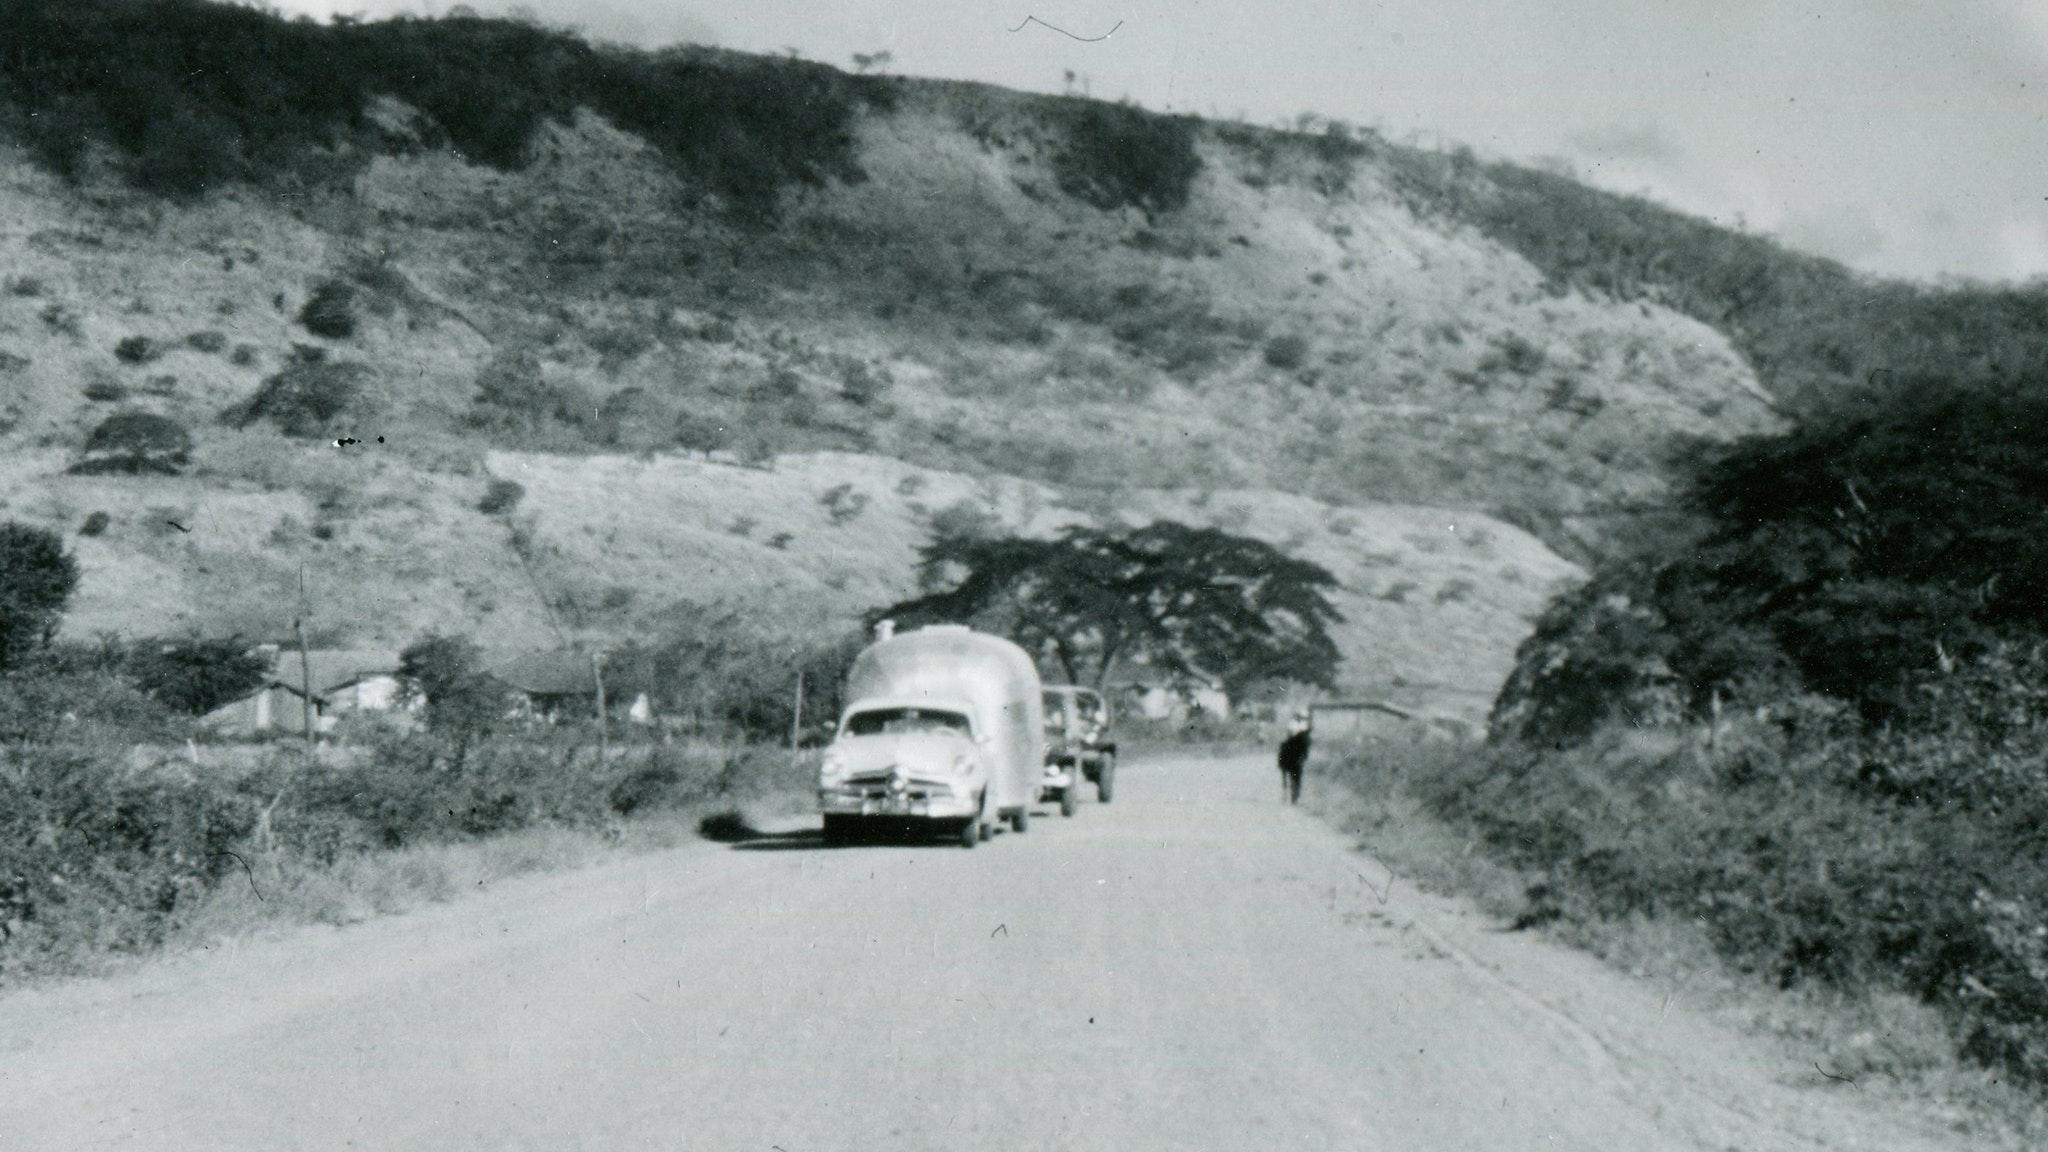 1951-1952-Mexico-Central-America-Caravan-Feature-PartIV